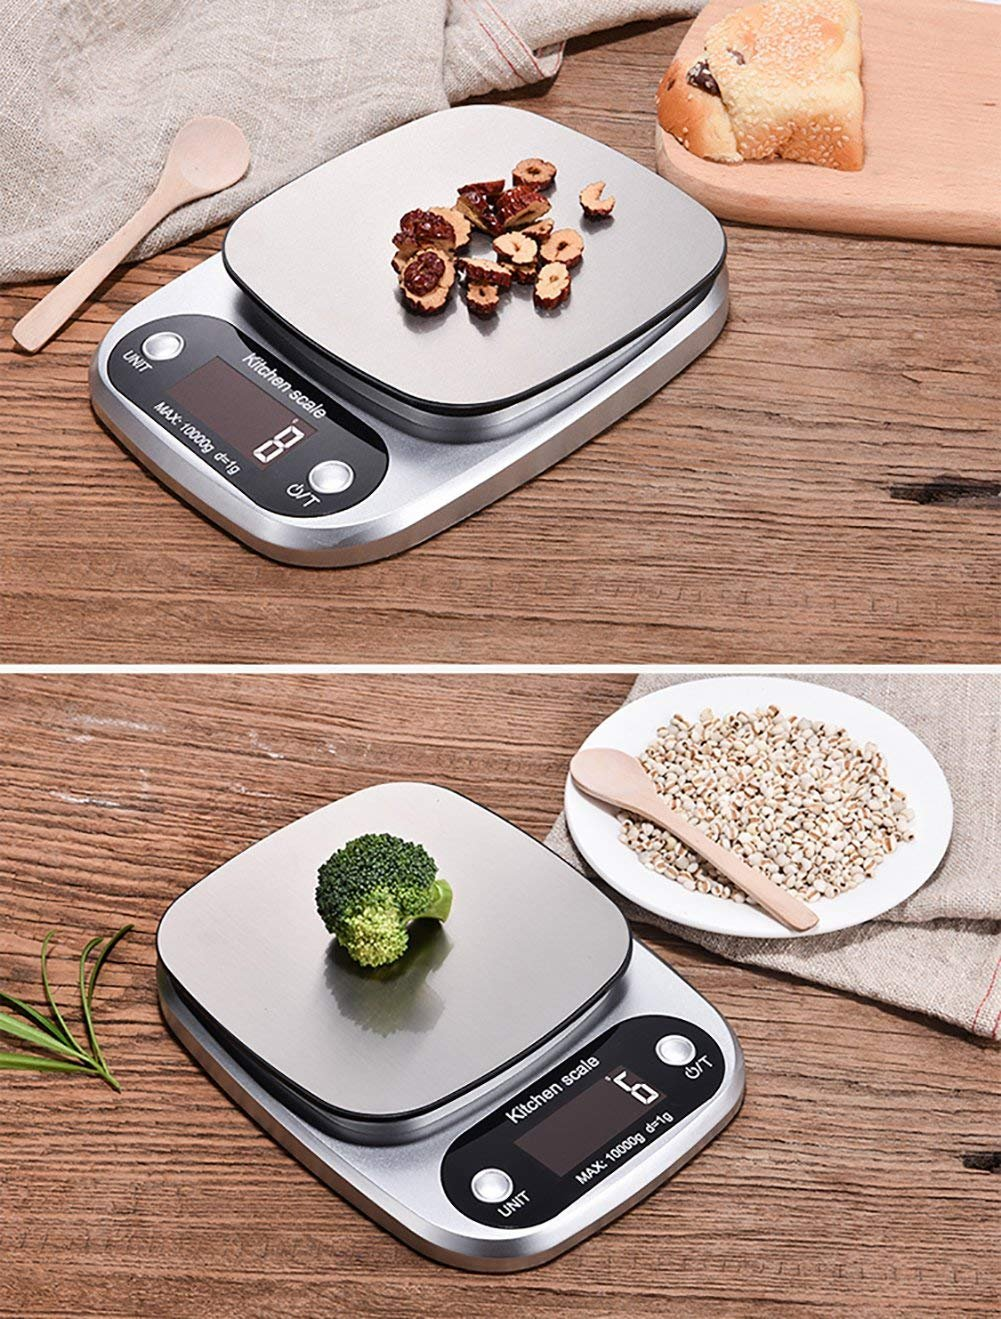 Escalas de cocina Vovoly Digital (10 kg / 1g), básculas de cocina electrónicas de alta precisión con gran pantalla retroiluminada para cocinar en el hogar, ...